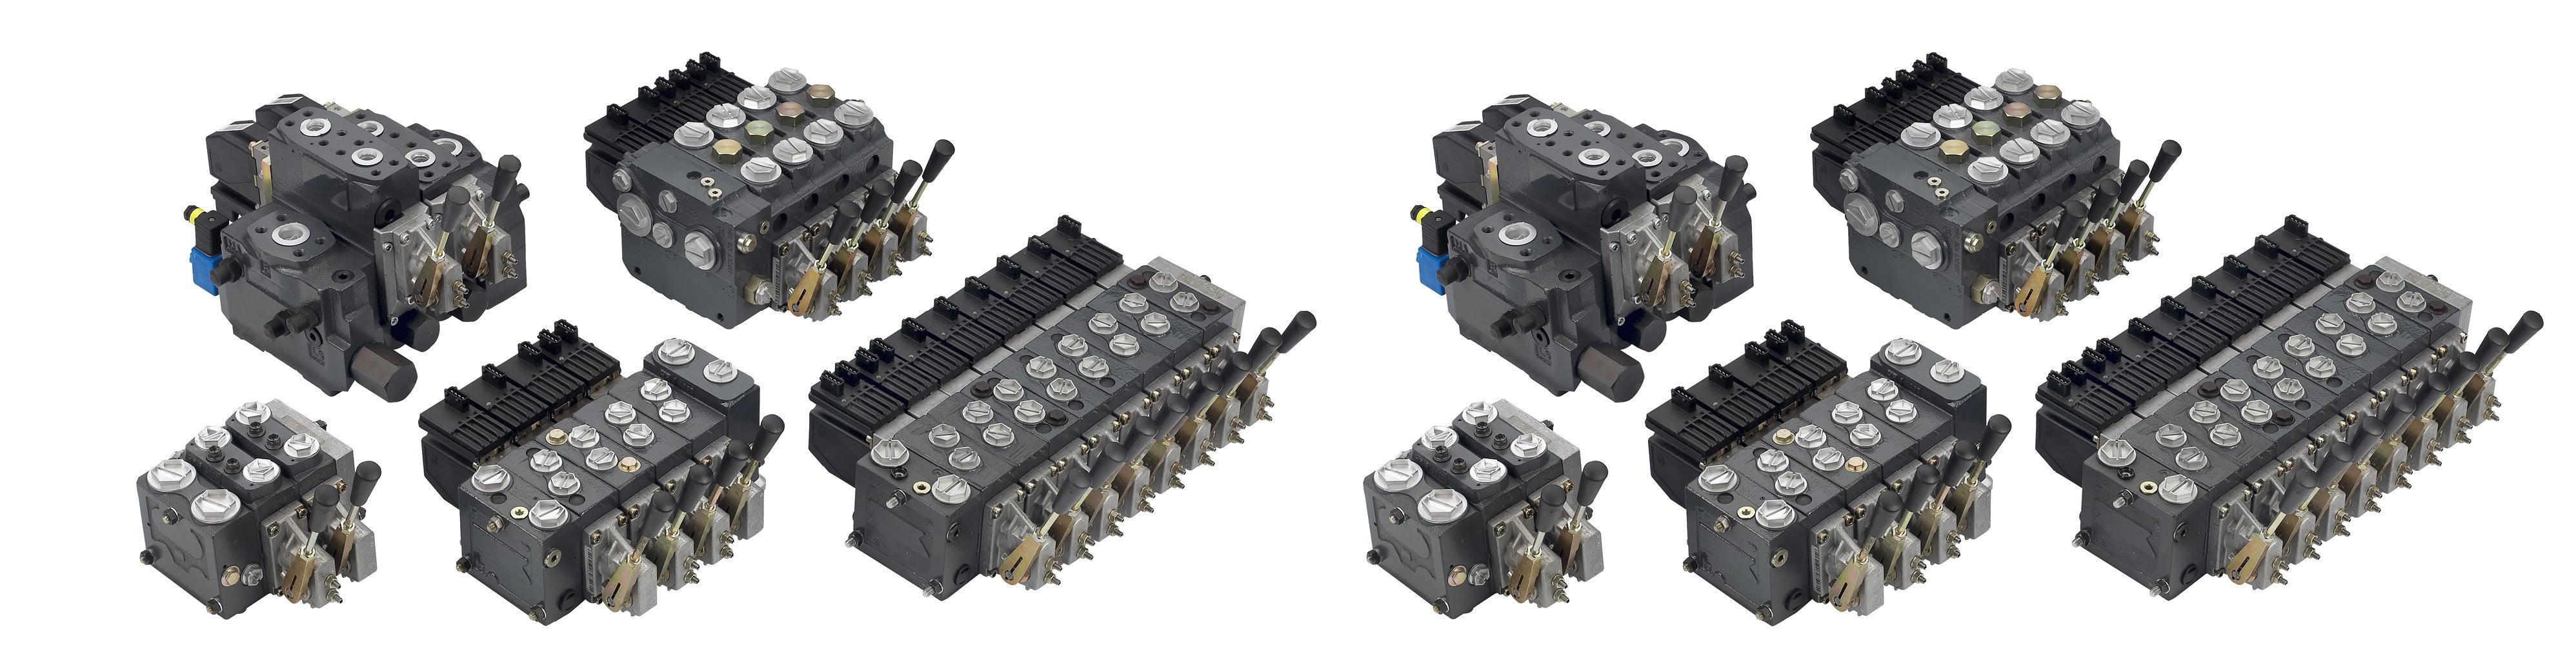 Danfoss Proportionalventile PVG 16